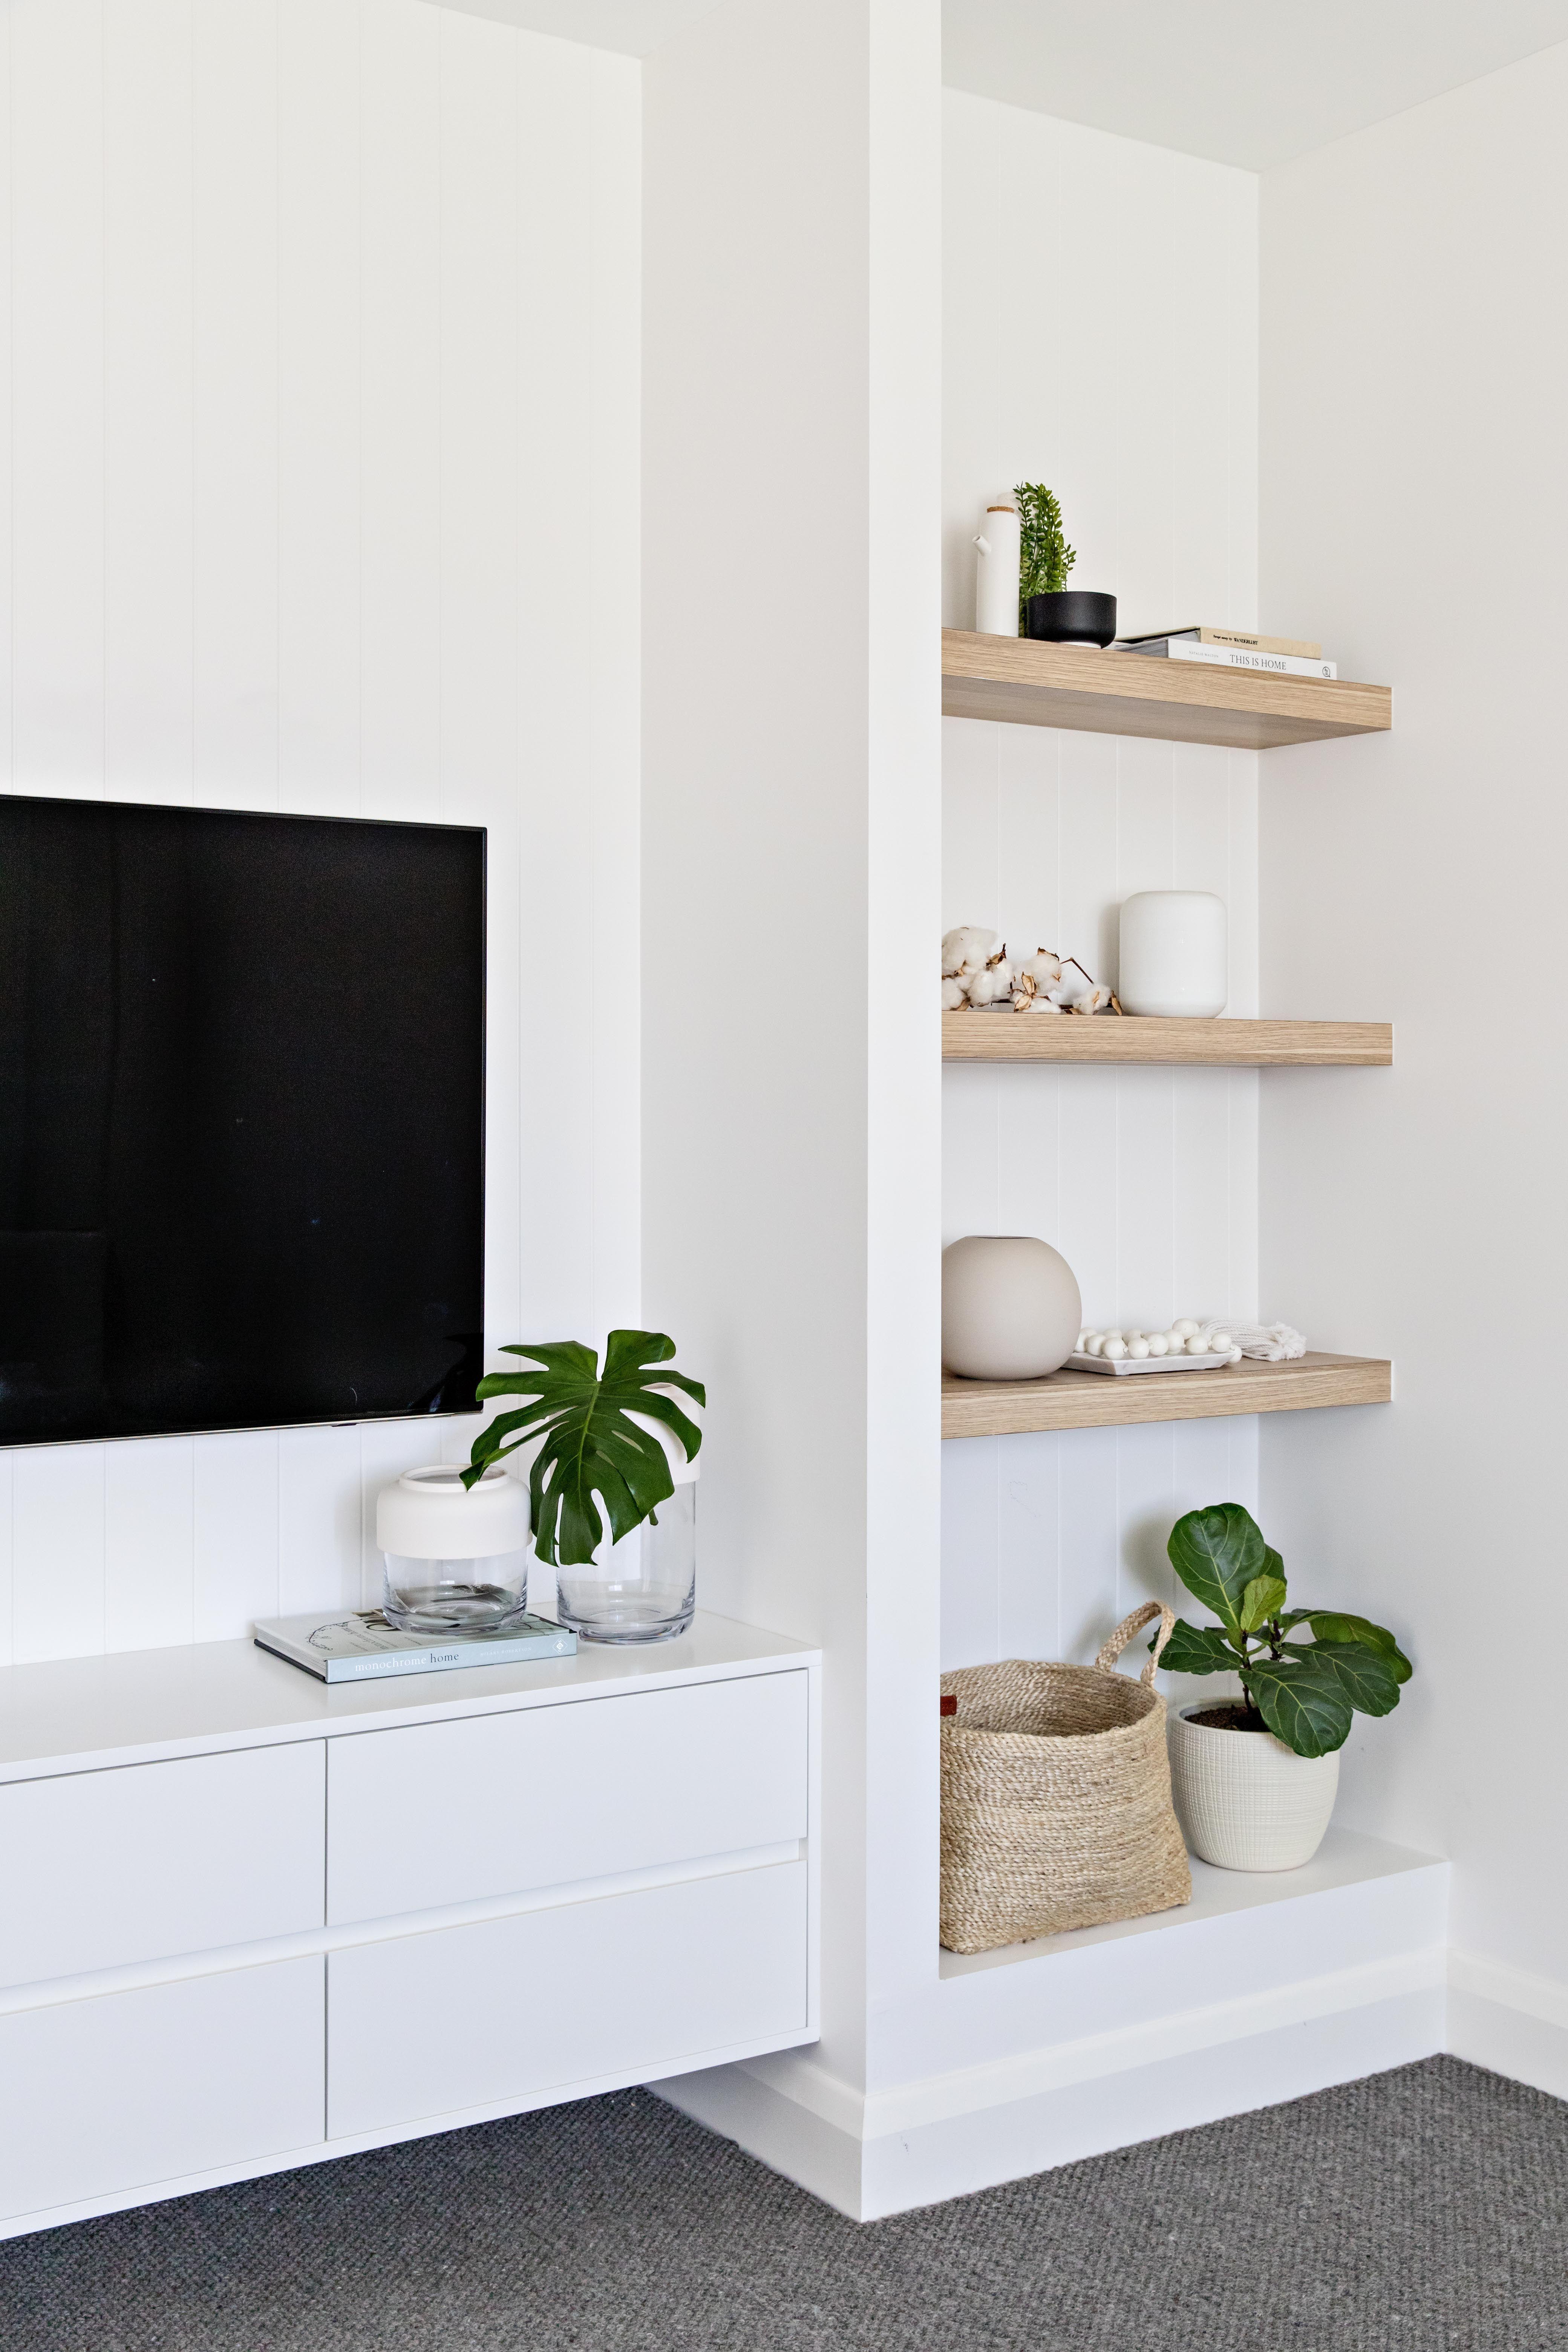 Your Living Room Decor Will Never Be The Same Livingroomideas Luxuryfurniture Interiord Modern Farmhouse Living Room Farm House Living Room House Interior